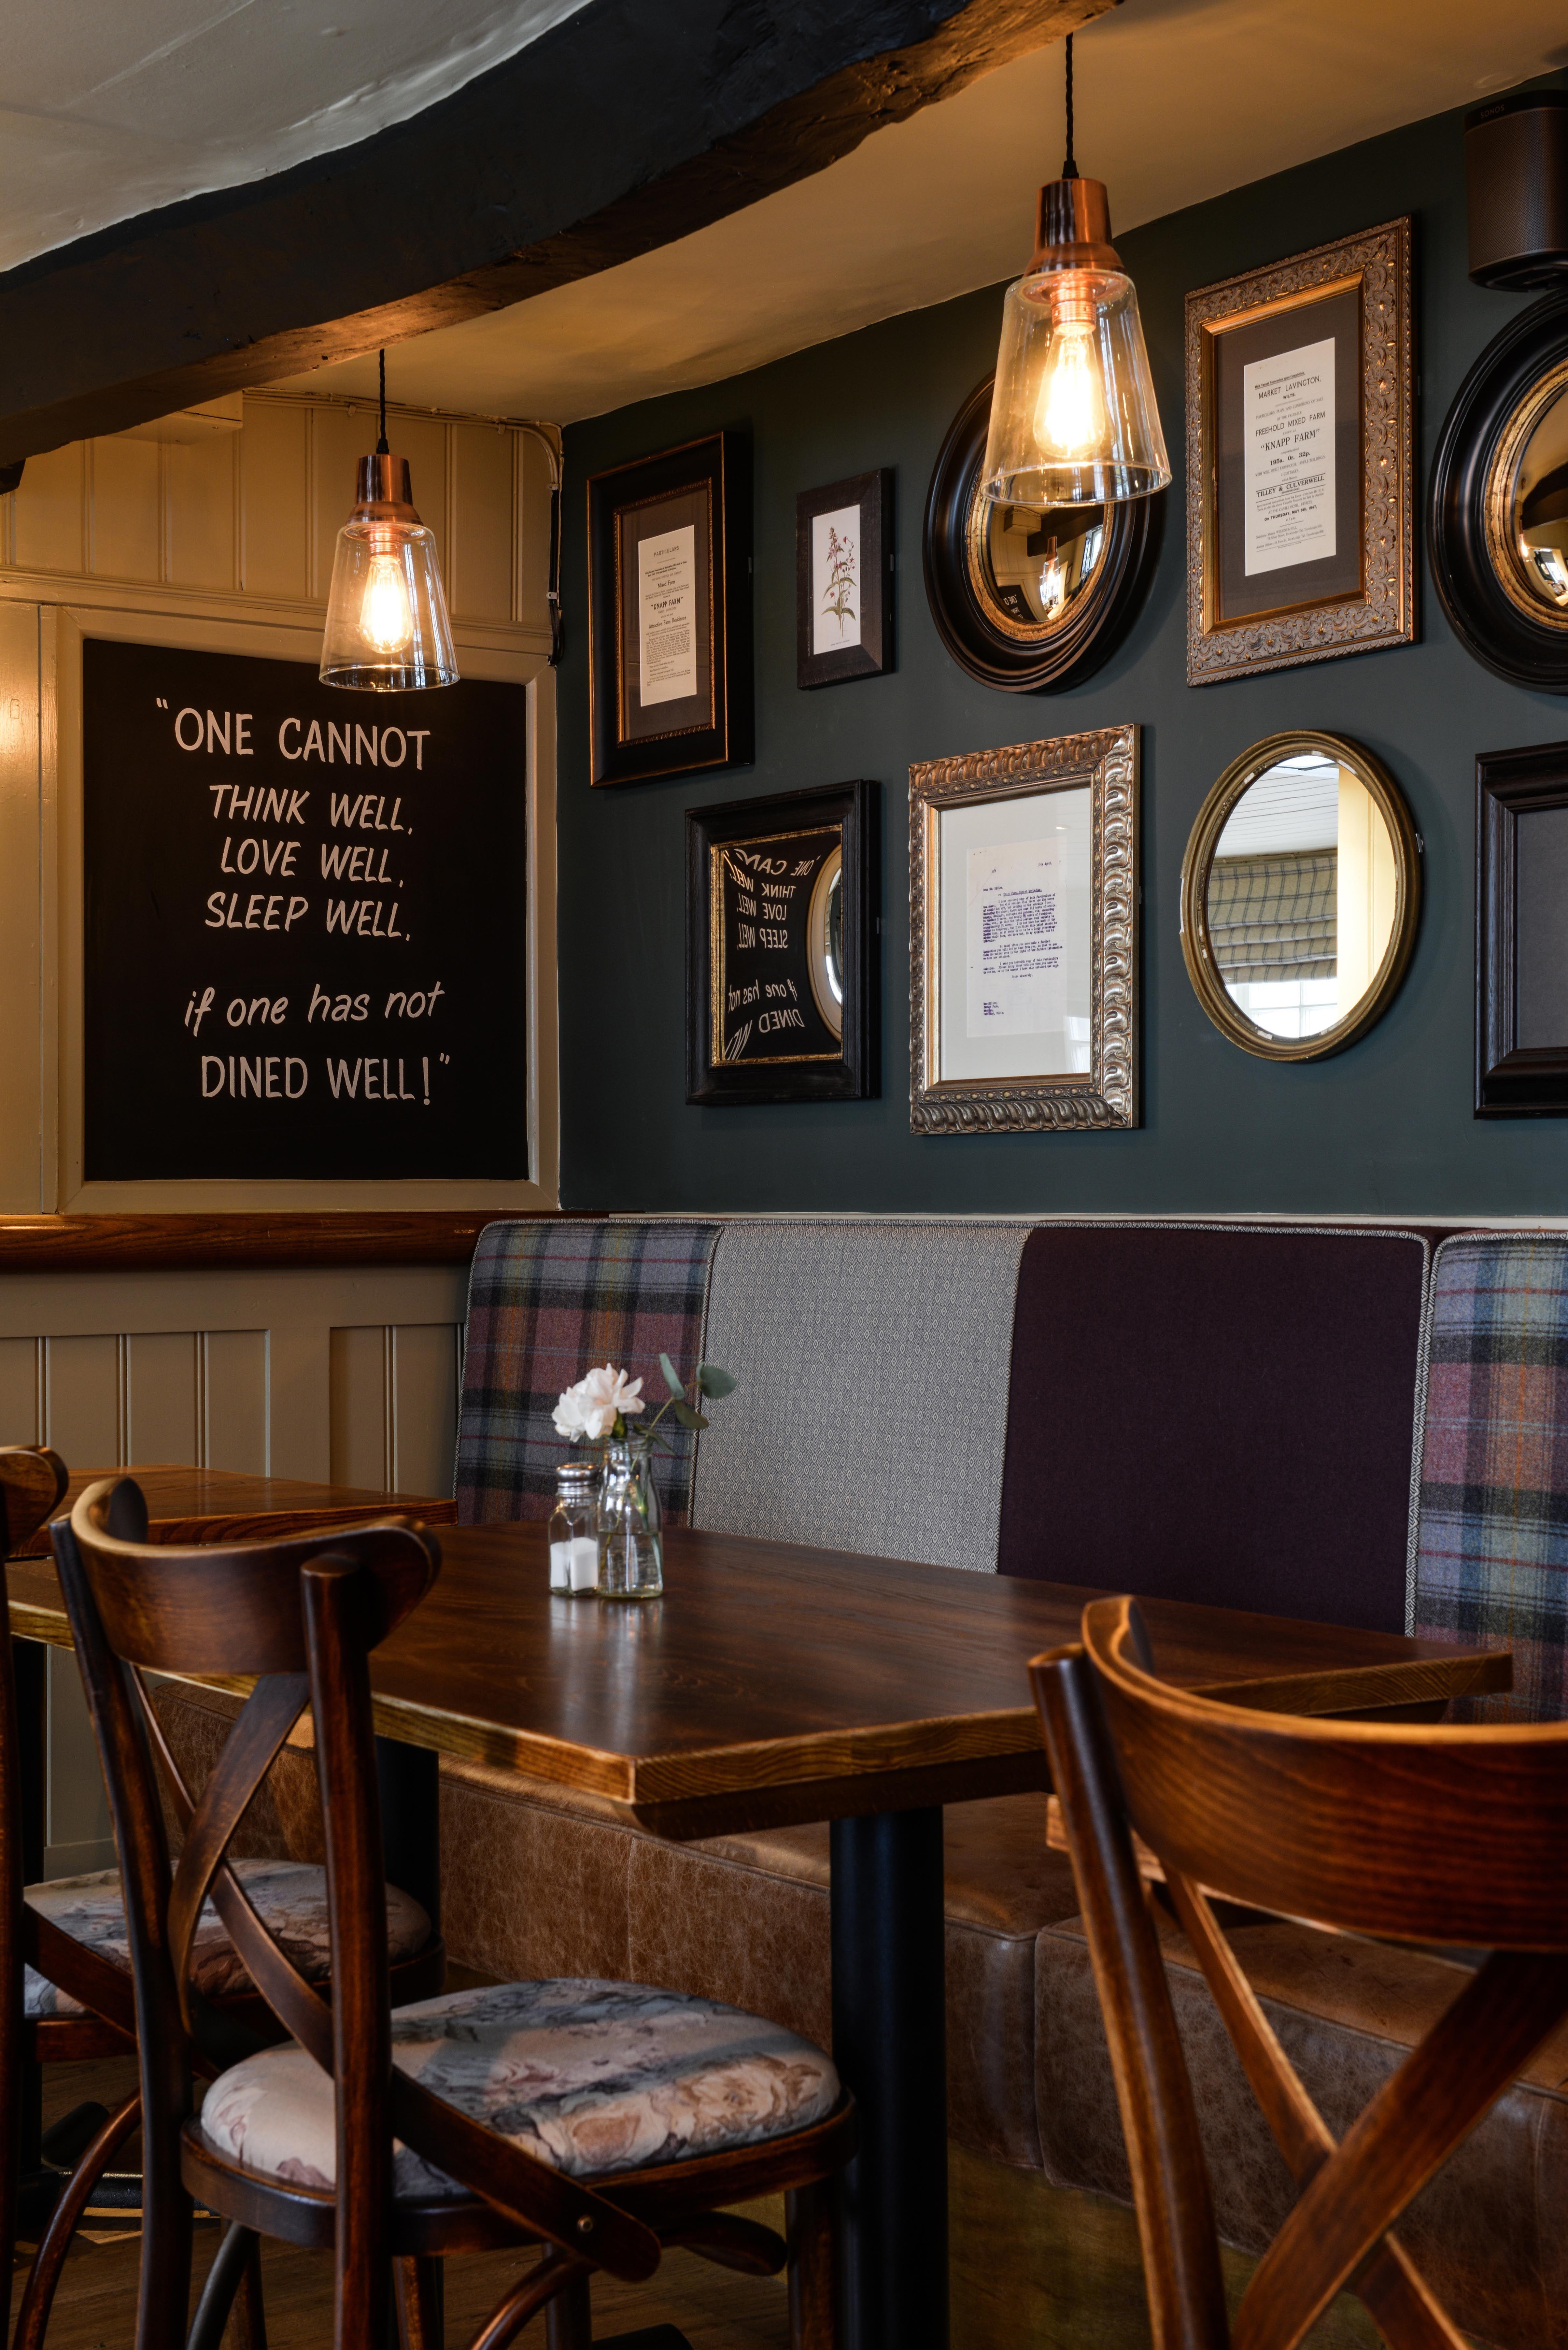 Green Dragon Market Lavington Focus Design Quirky Country Pub